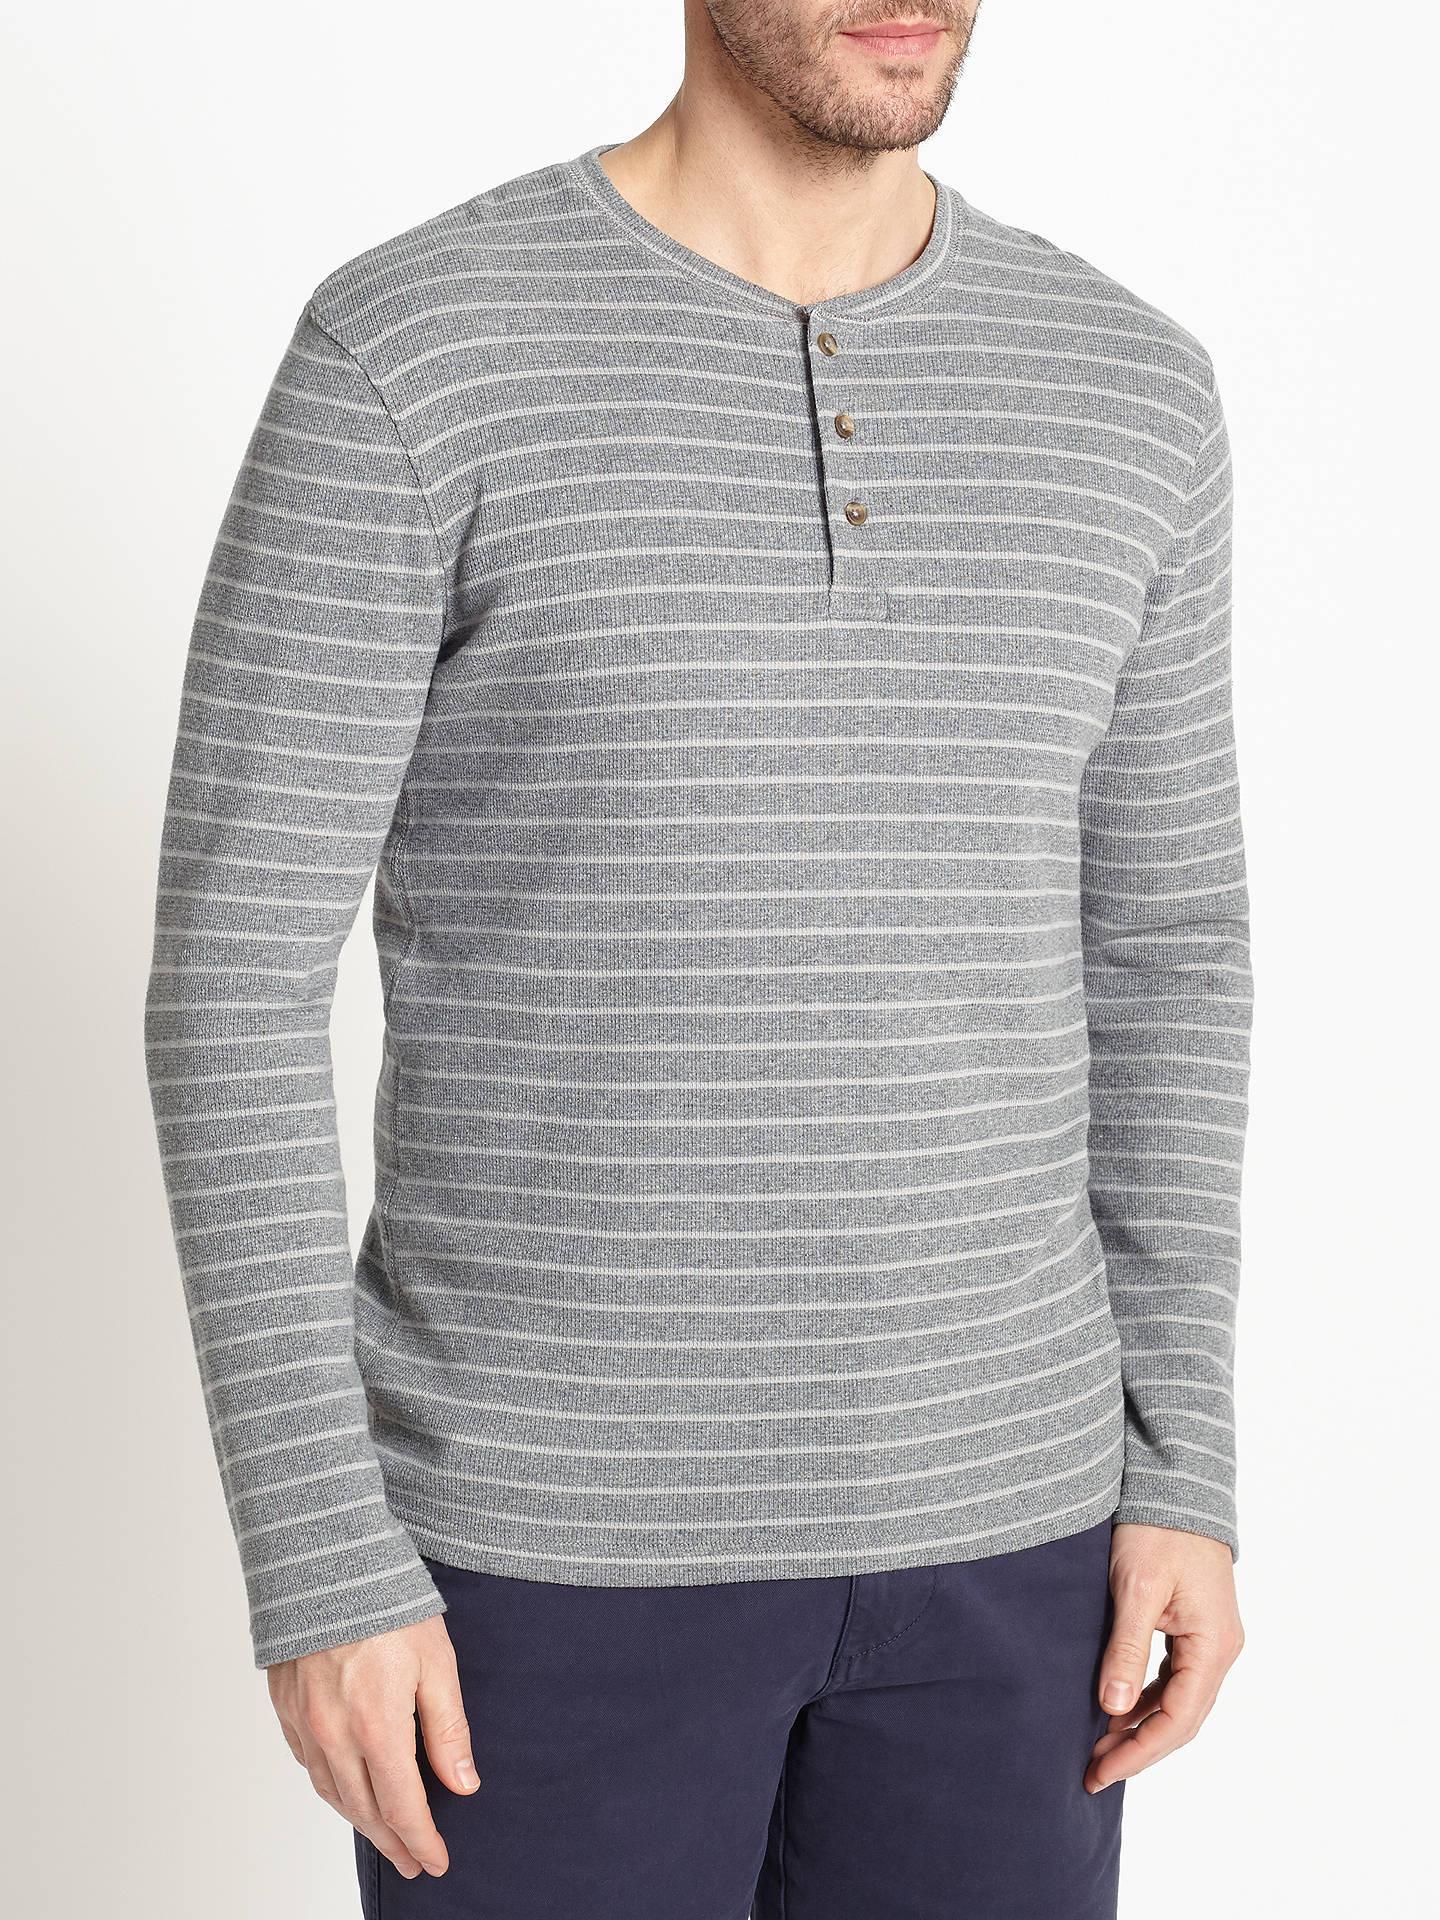 99dab757ea45 Buy John Lewis Stripe Waffle Henley Shirt, Grey, S Online at johnlewis.com  ...